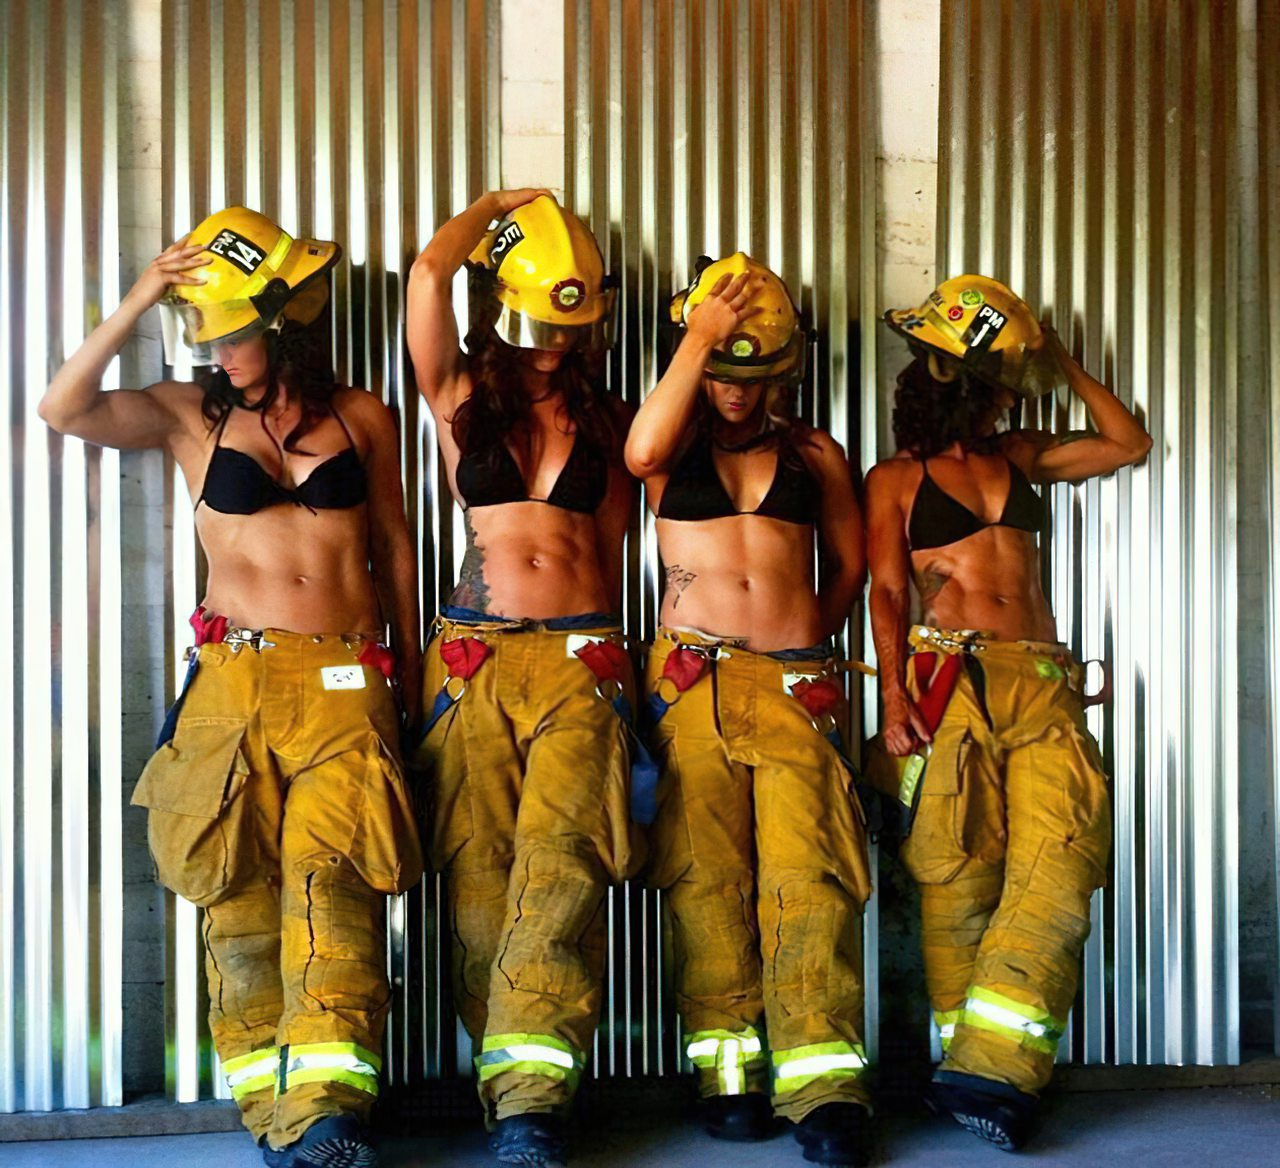 Fotos de Mulheres (14)